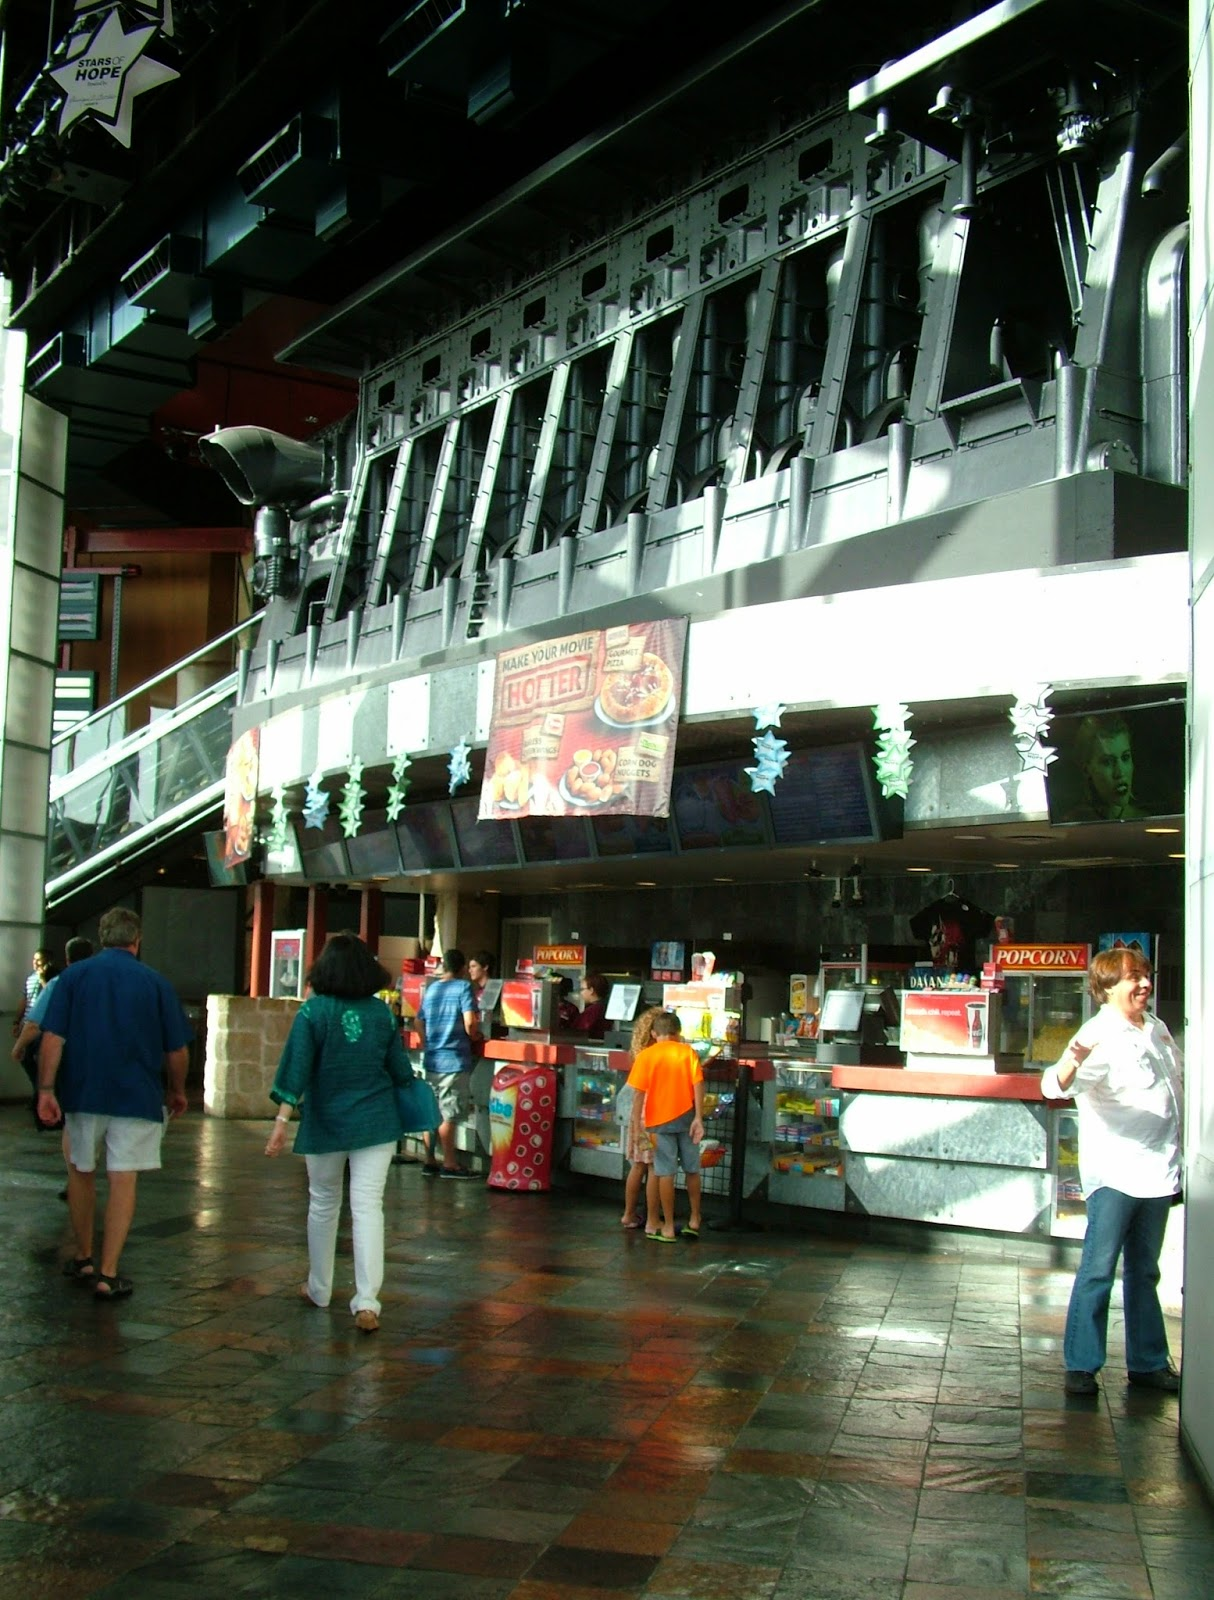 Alamo Quarry Market (North Central San Antonio)